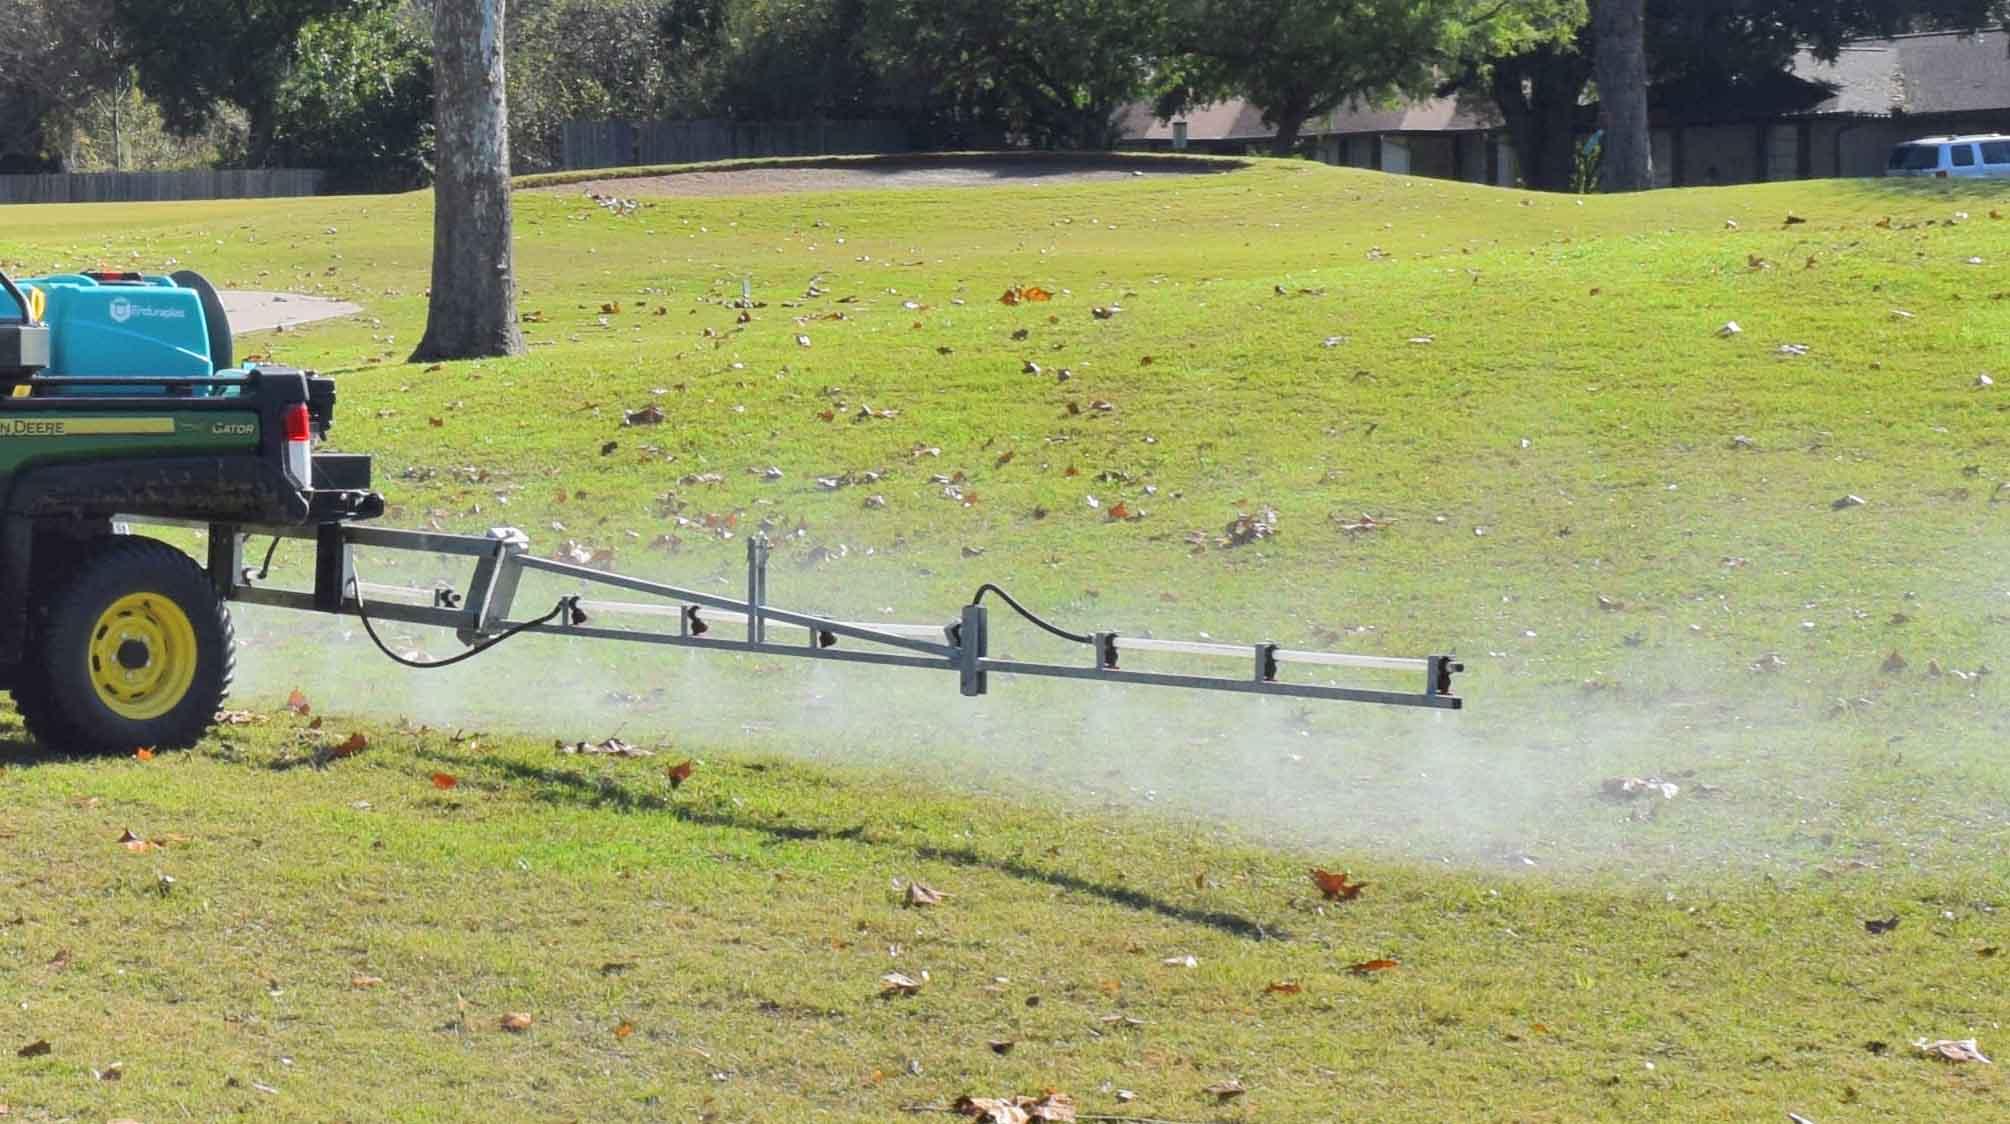 10 Effective Ways To Reduce Spray Drift While Boom Spraying.jpg